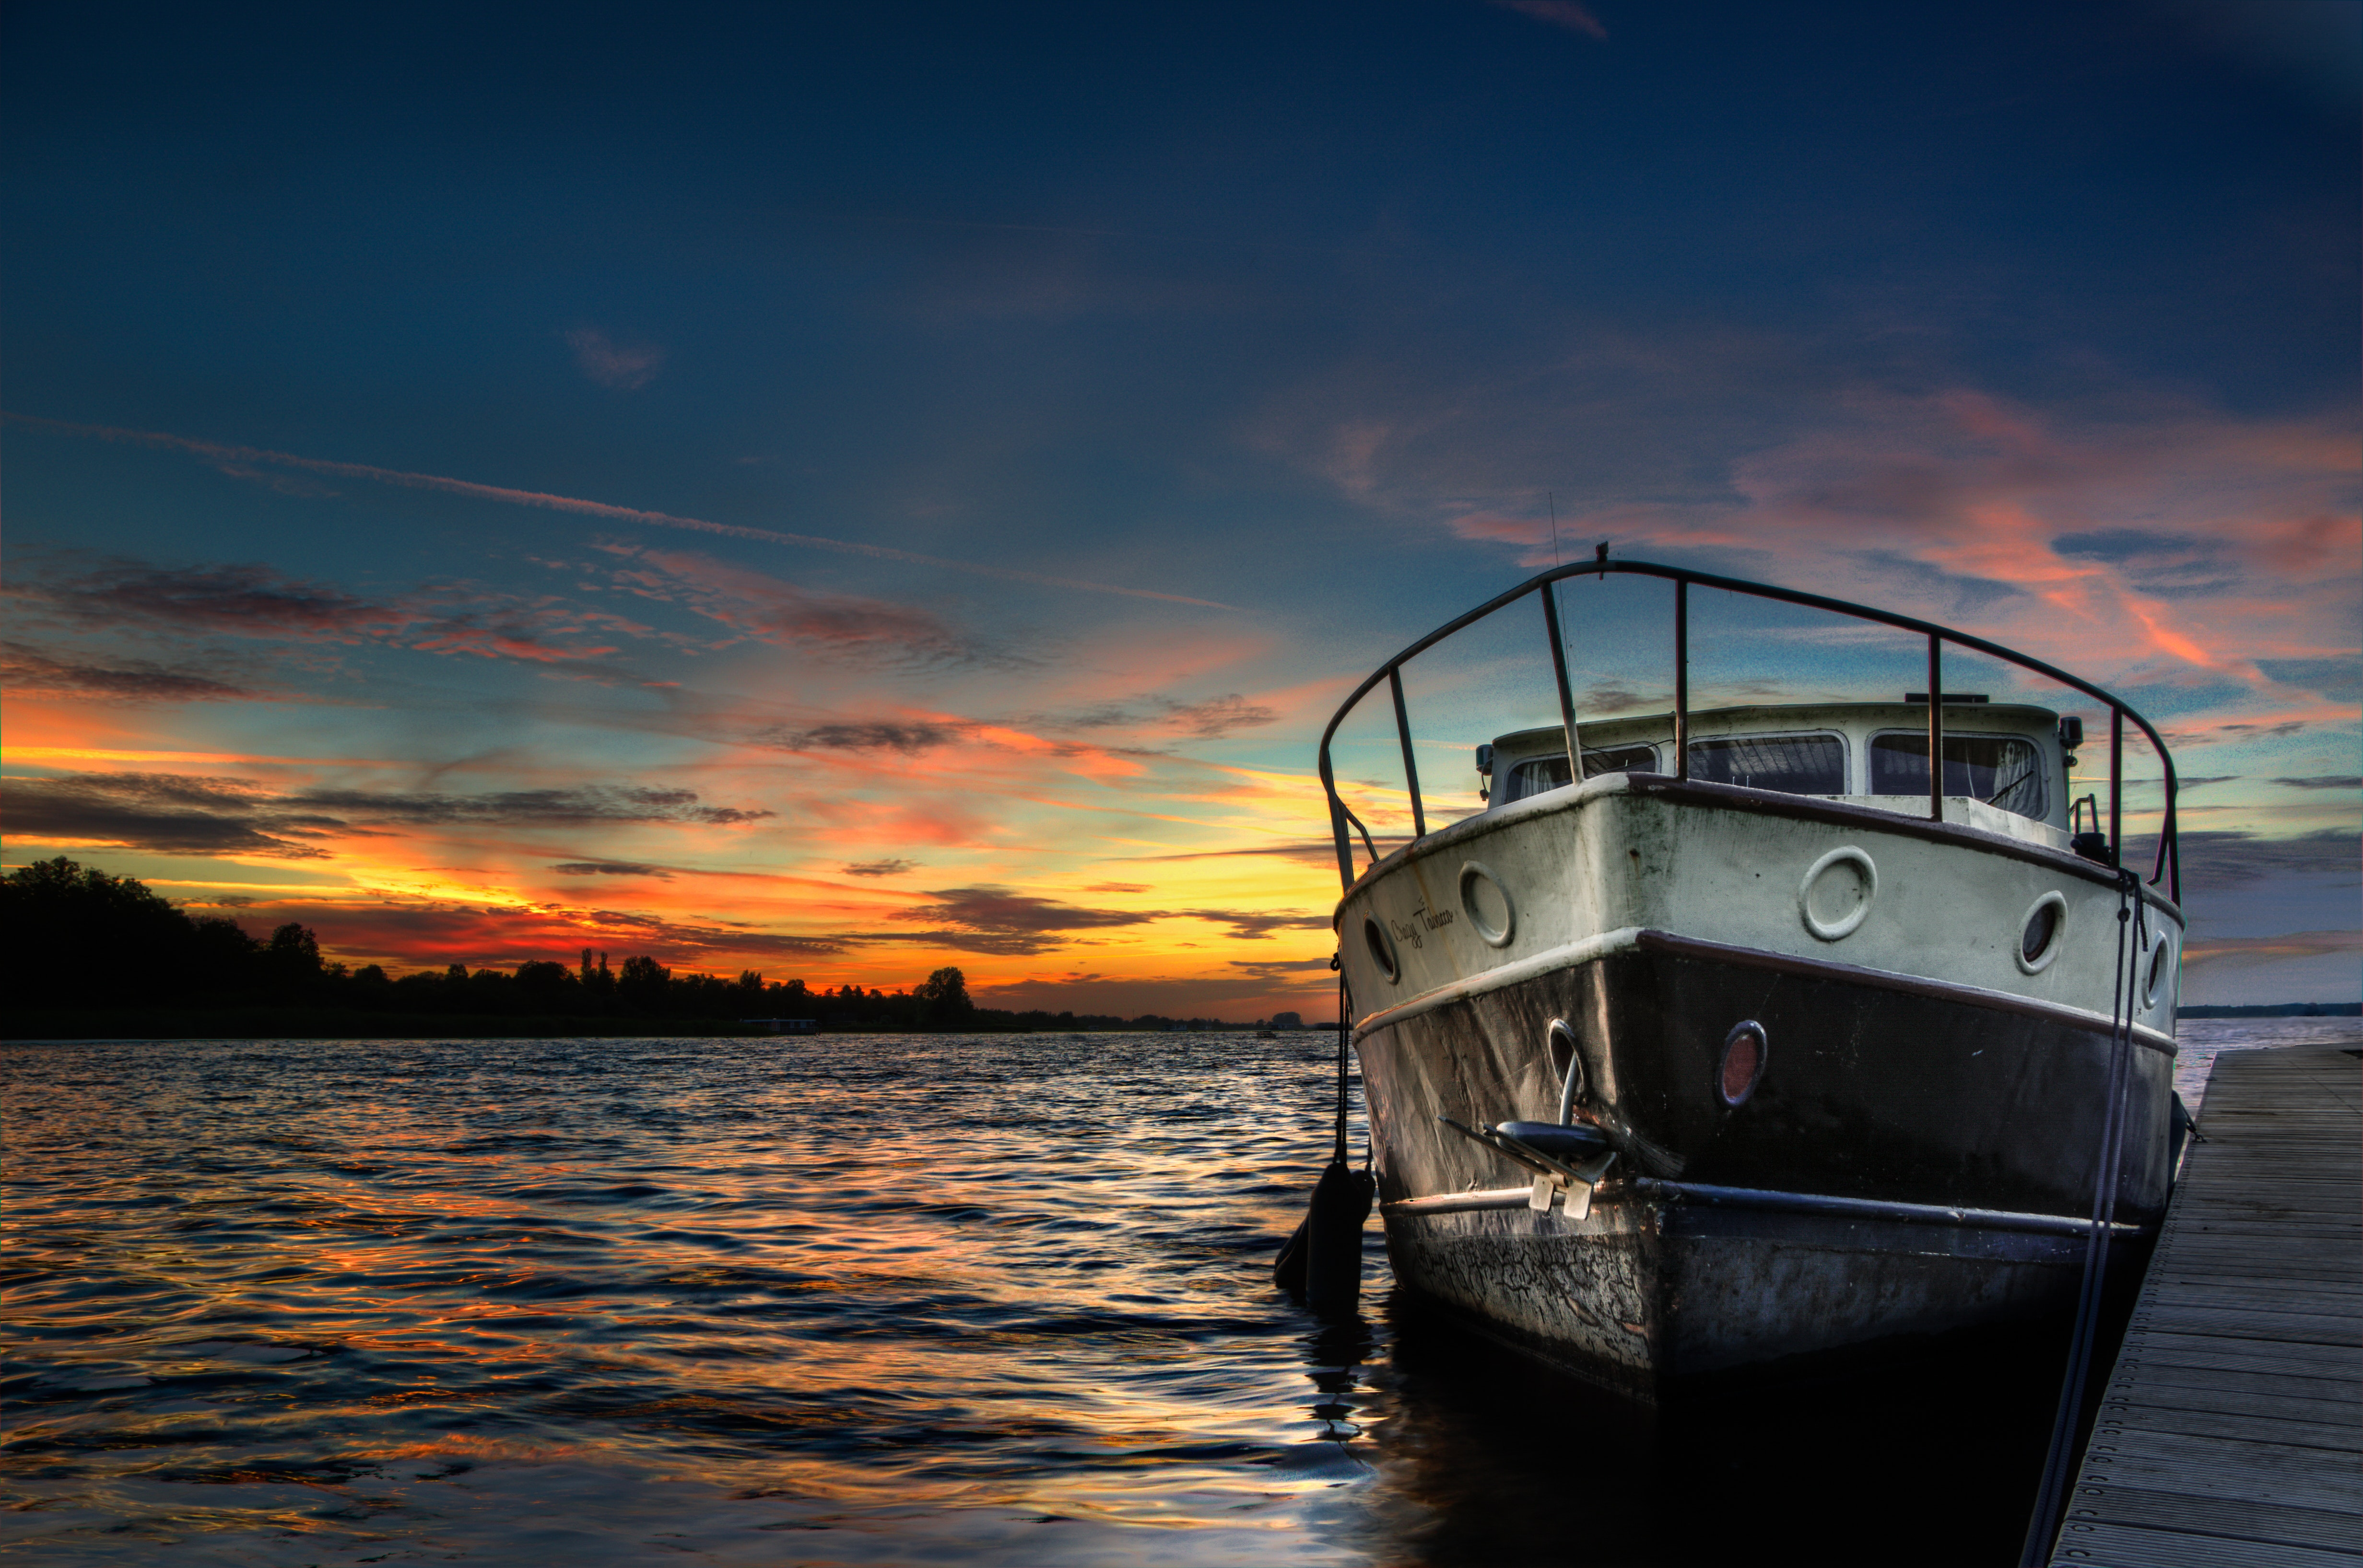 Free stock photo of boat, dusk, hdr